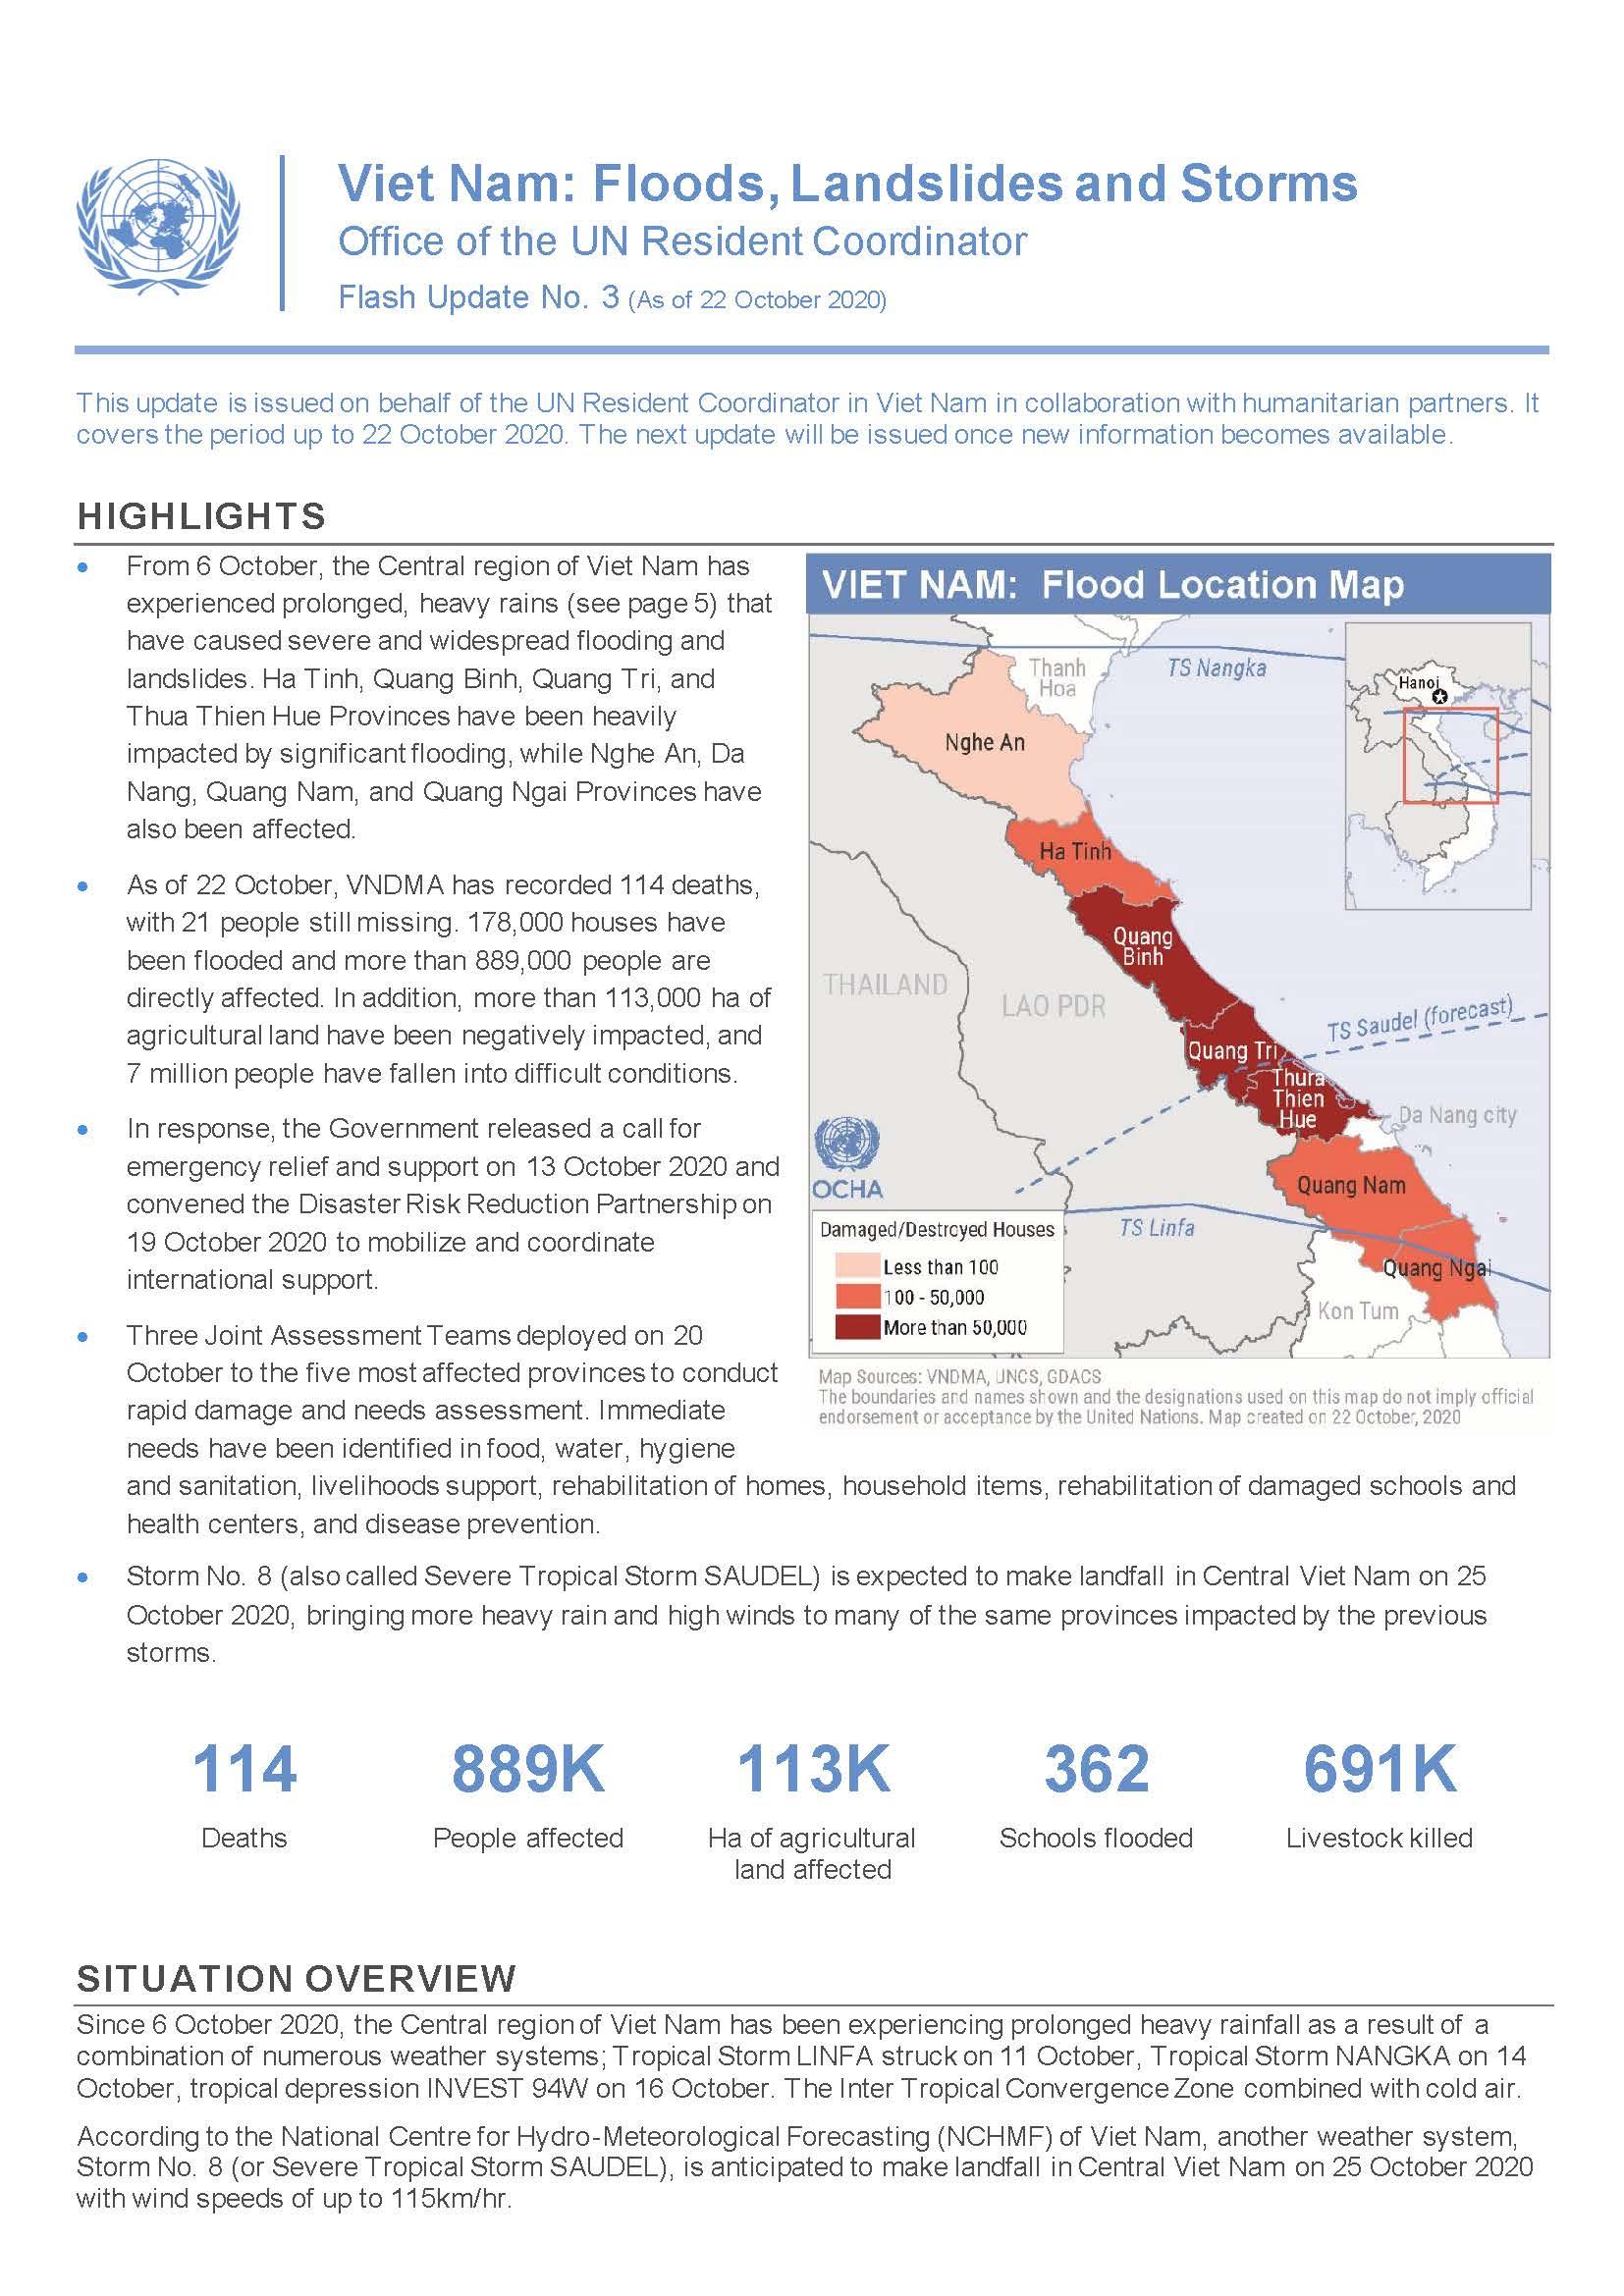 Viet Nam: Floods, Landslides and Storms Flash Update No. 3 (As of 2 2 October 2020)